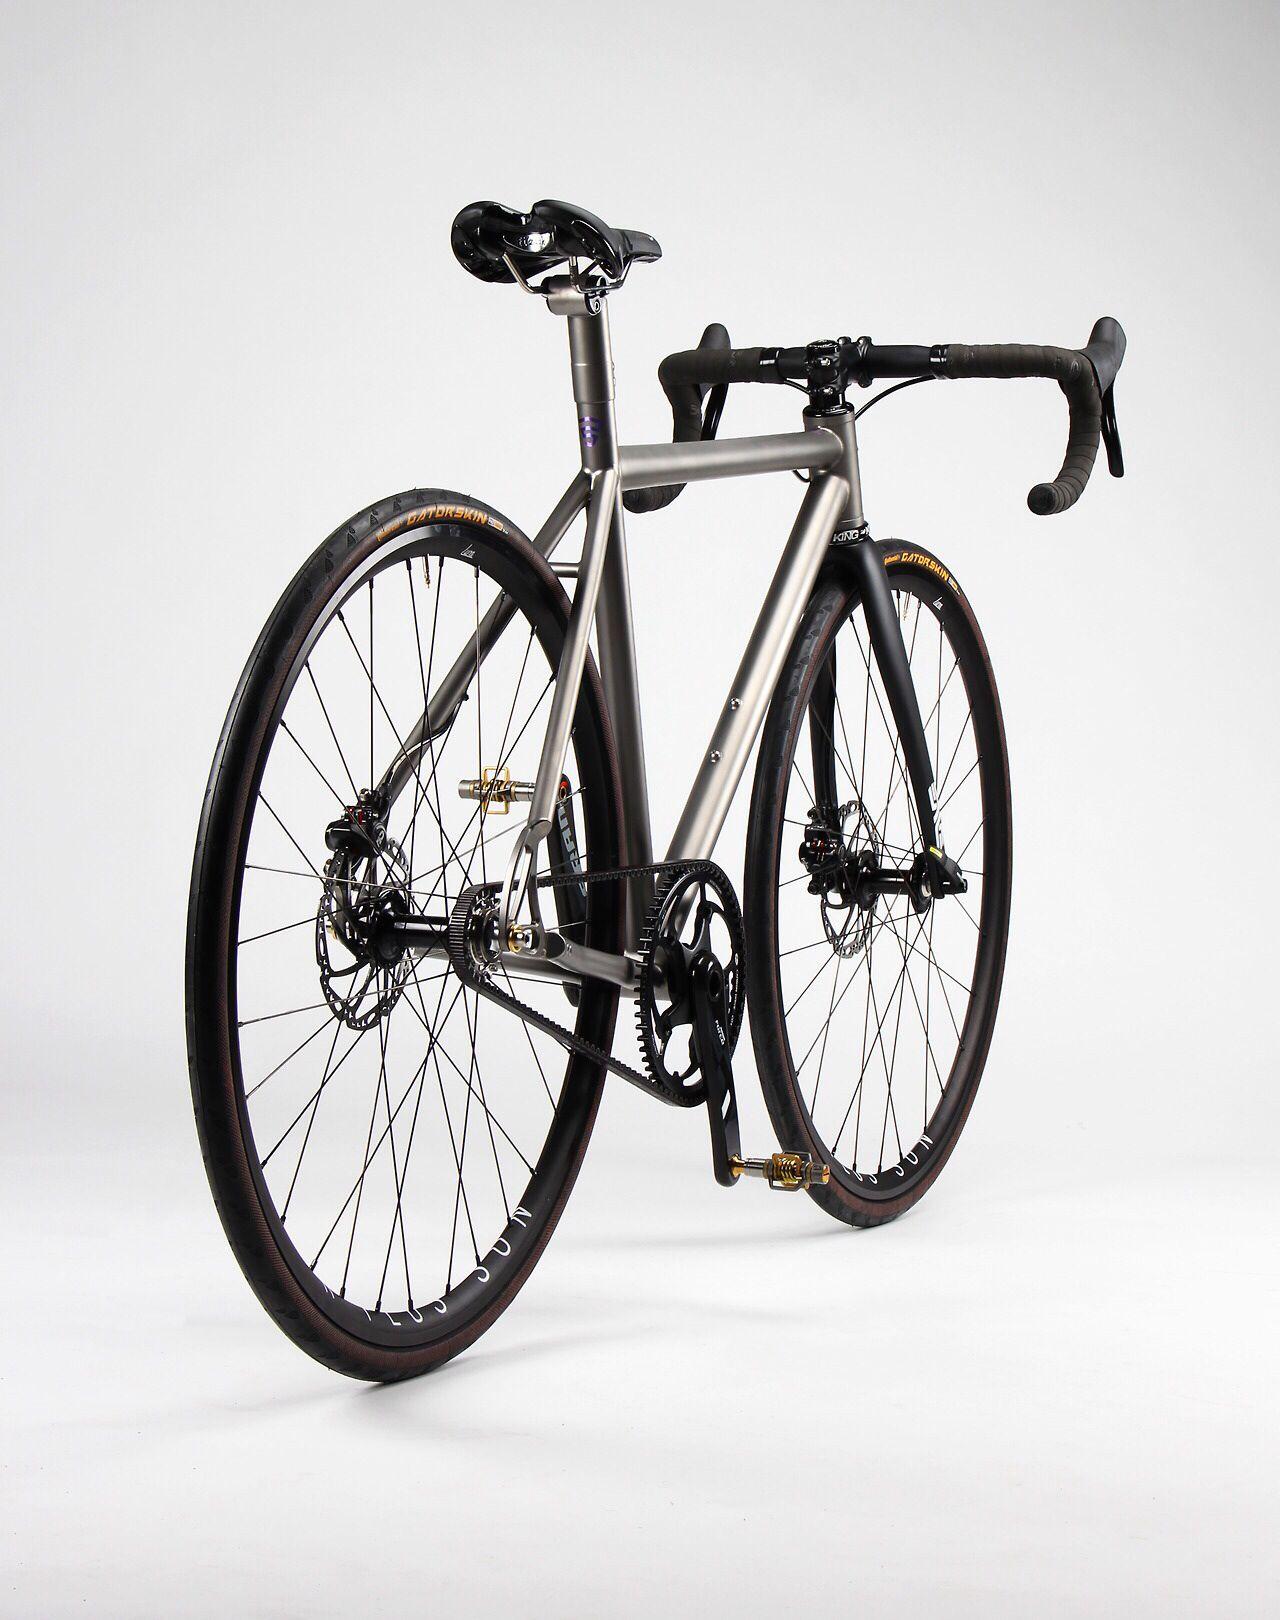 F I R E F L Y With Images Titanium Road Bike Bicycle Design